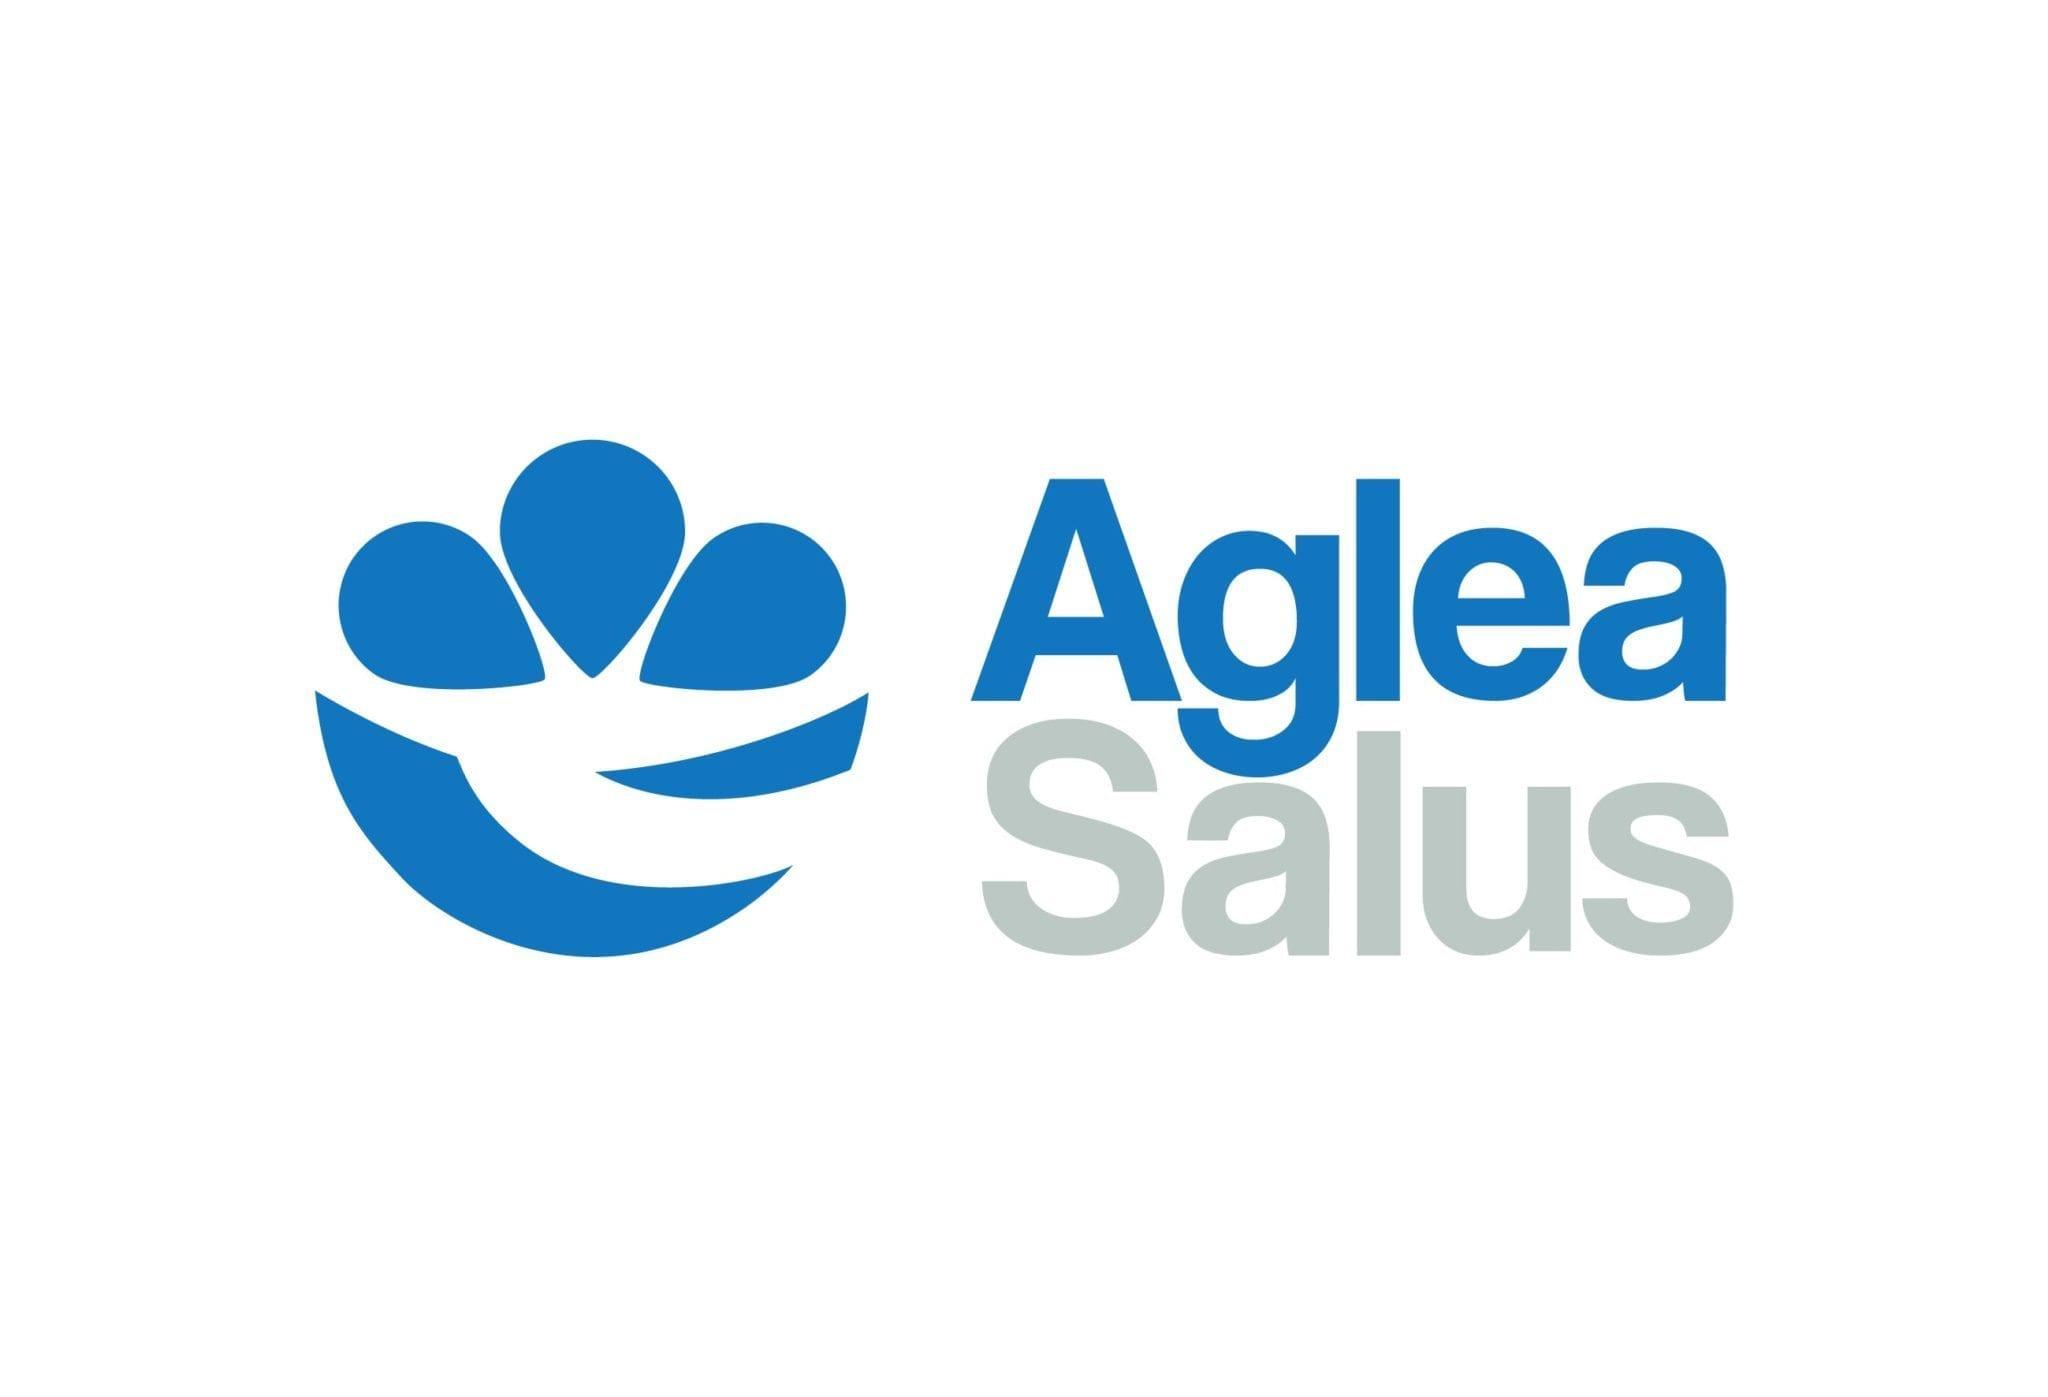 Aglea Salus 2-01-01